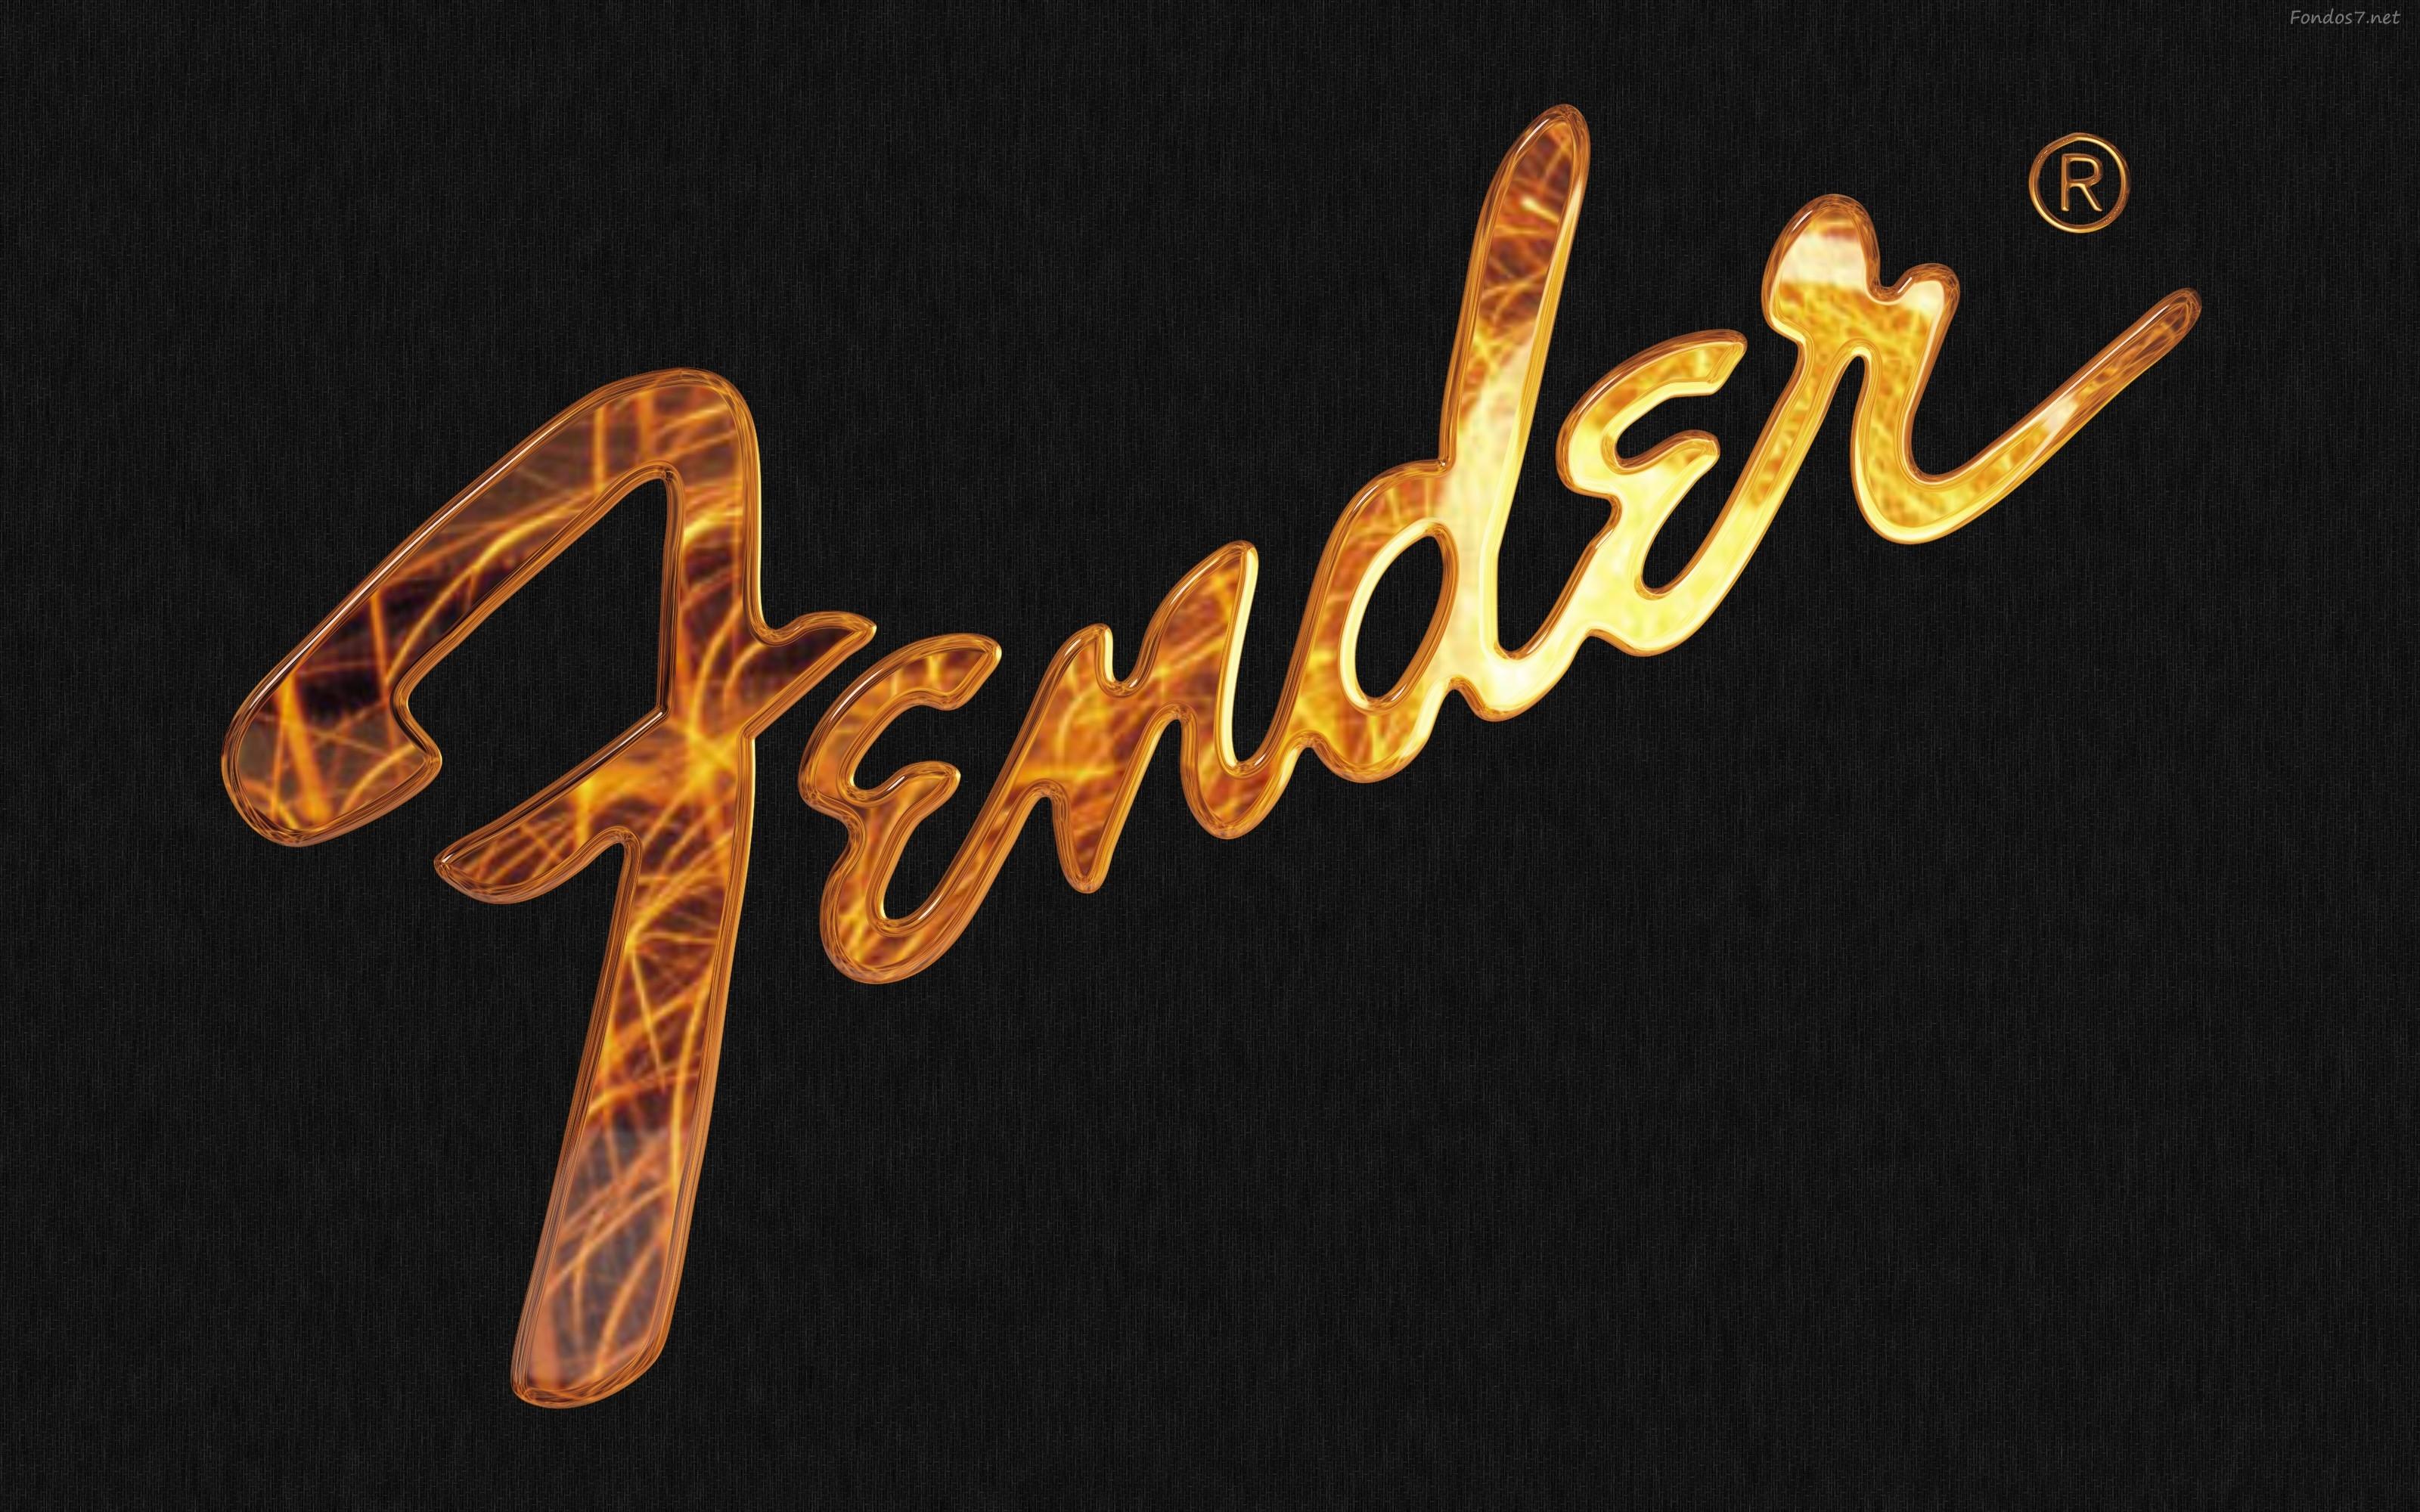 Fender Wallpapers   Taringa 3200x2000